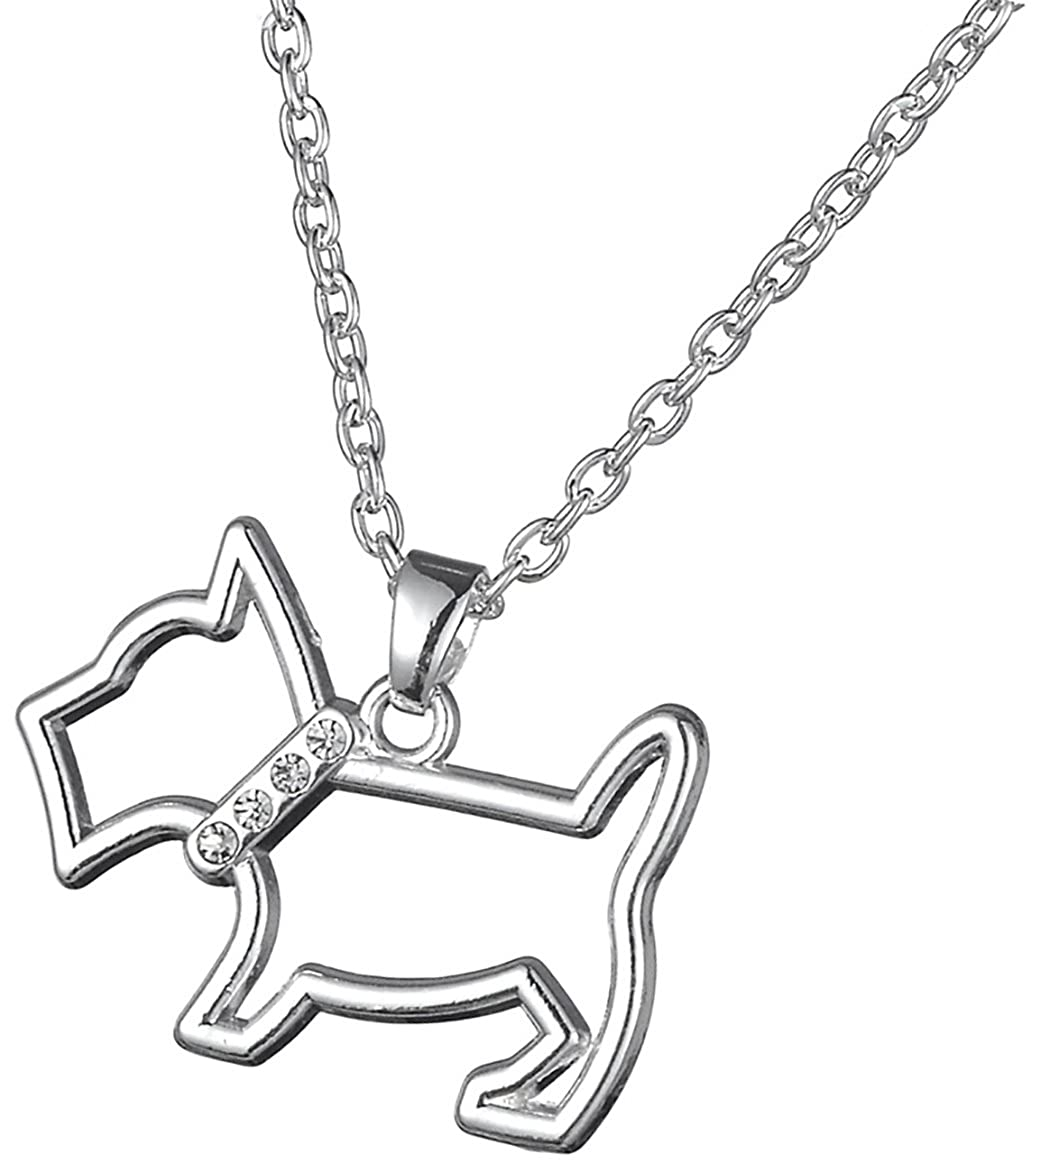 Animal Joyería Forma de Perro Escocés hueca colgante de cristal collar para perro persona Regalo BiChuang